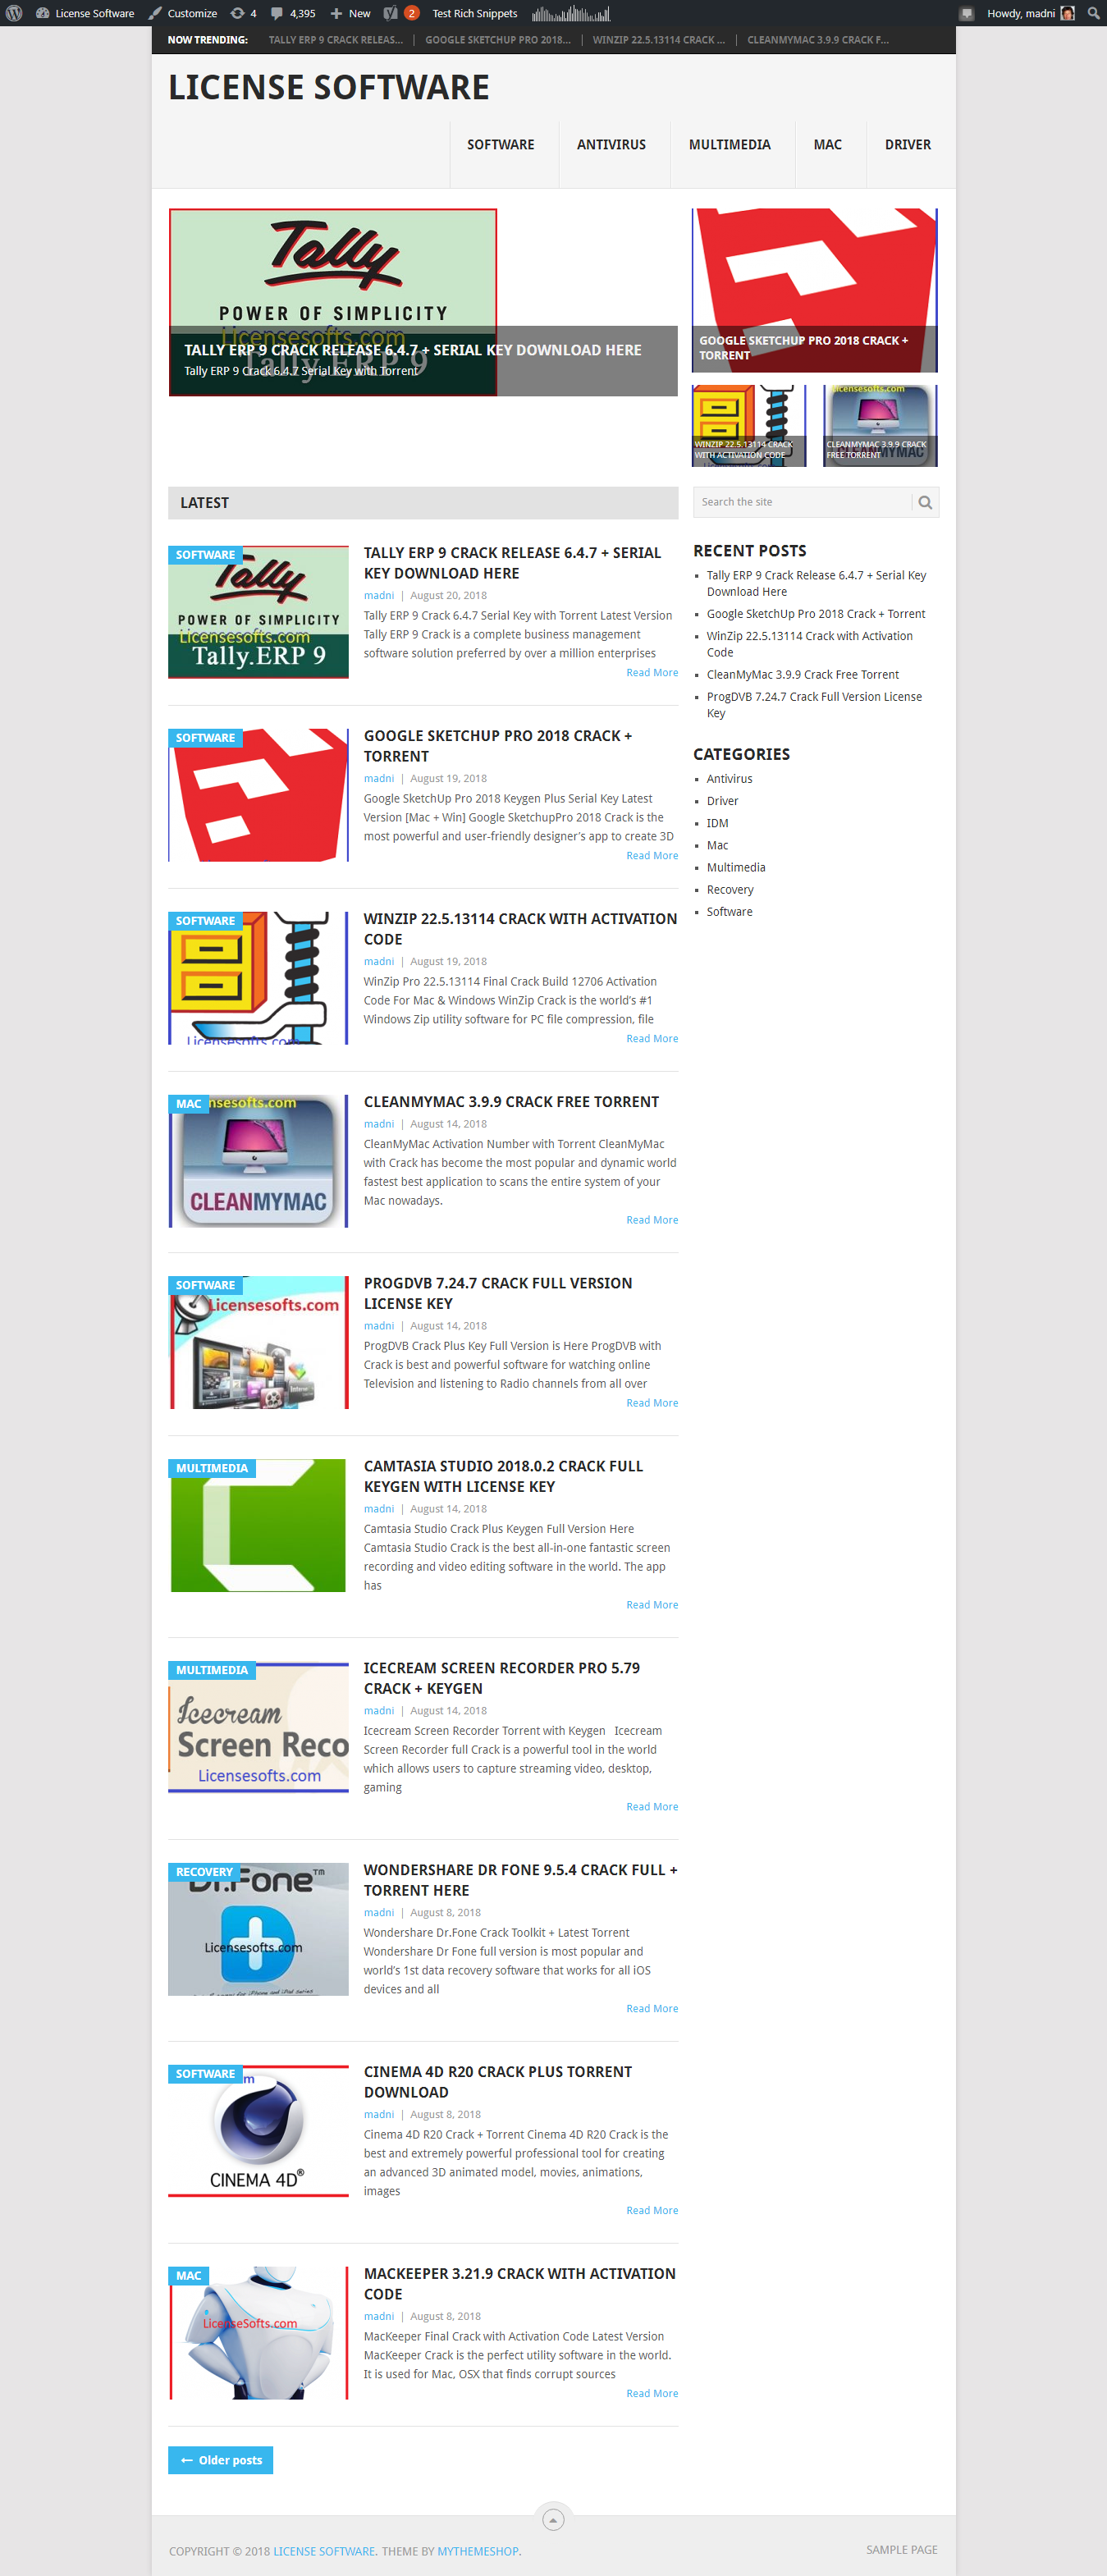 best website to download cracked software